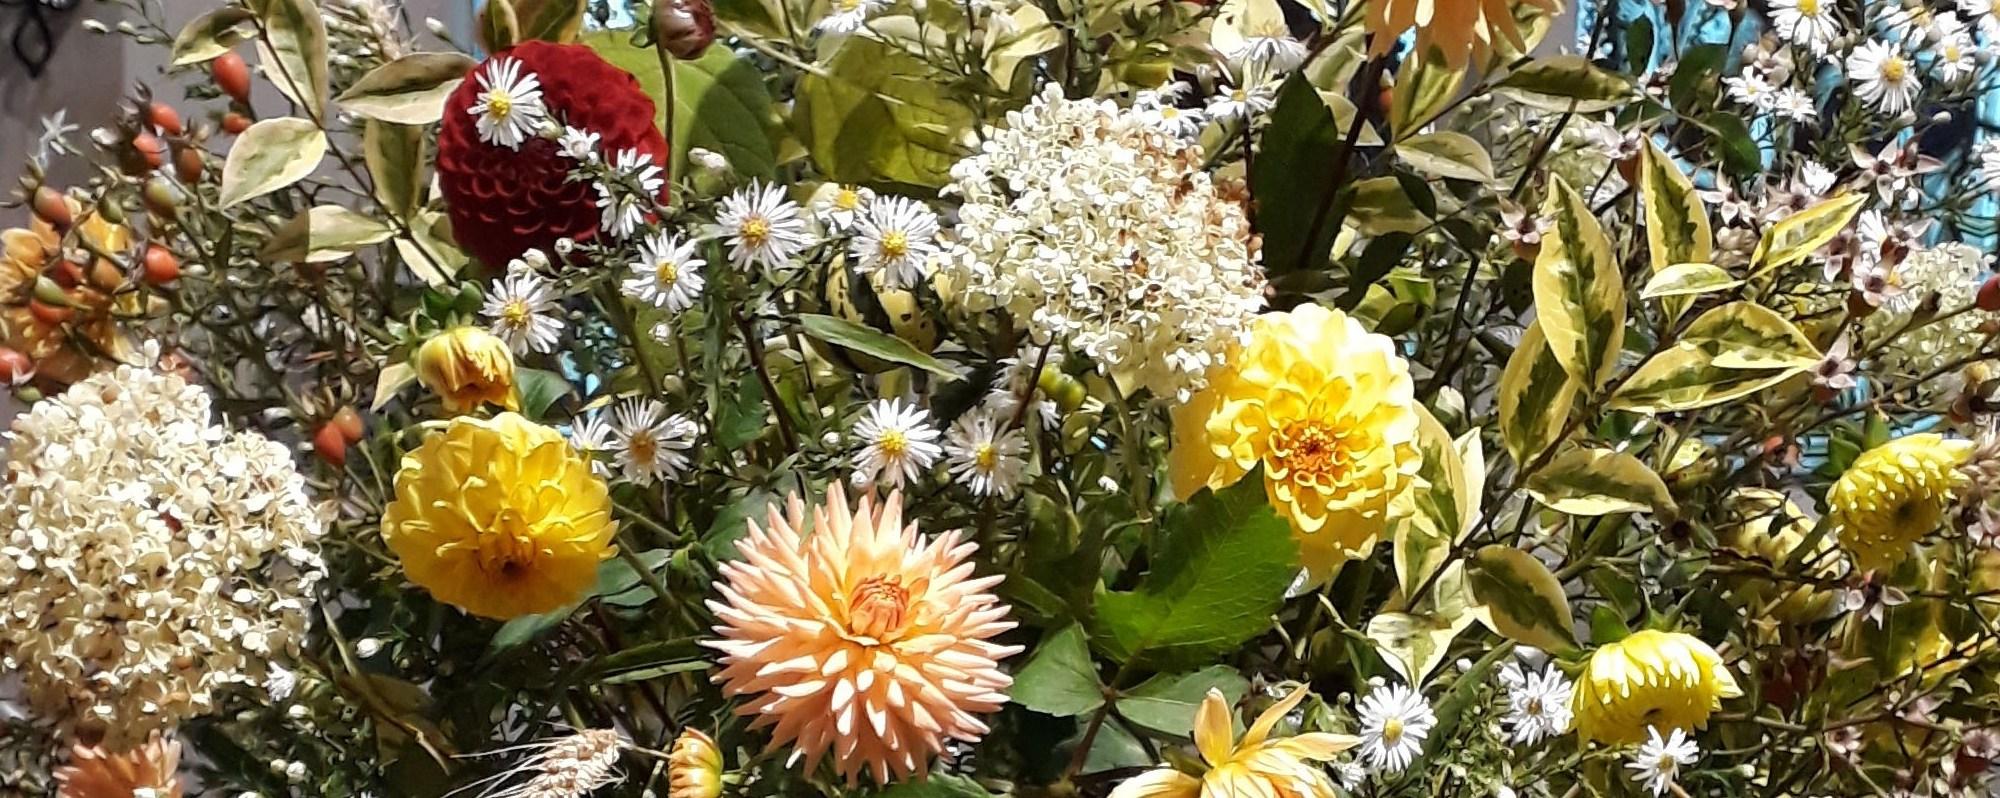 Detail of flower arrangement